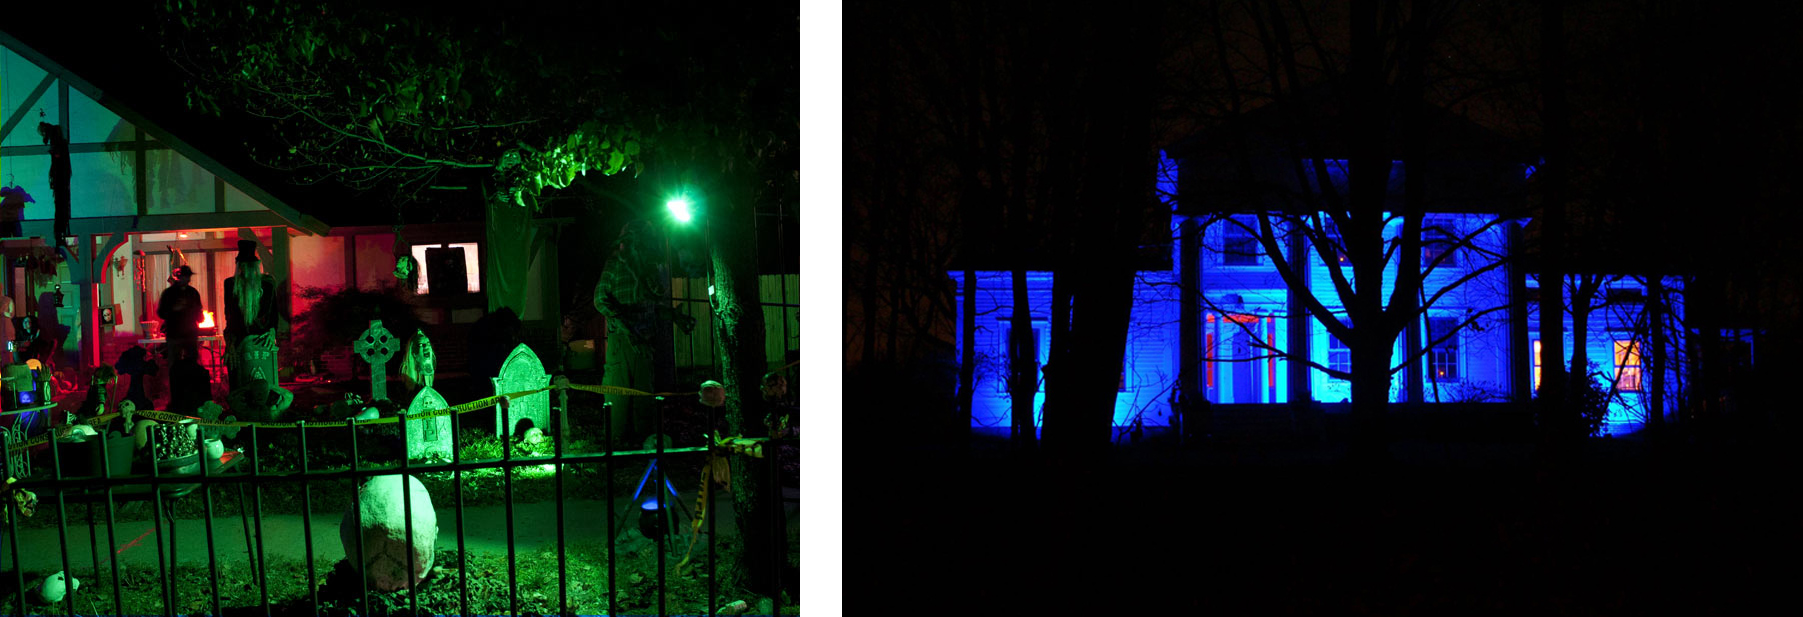 Halloween lights - LED flood light wall washing